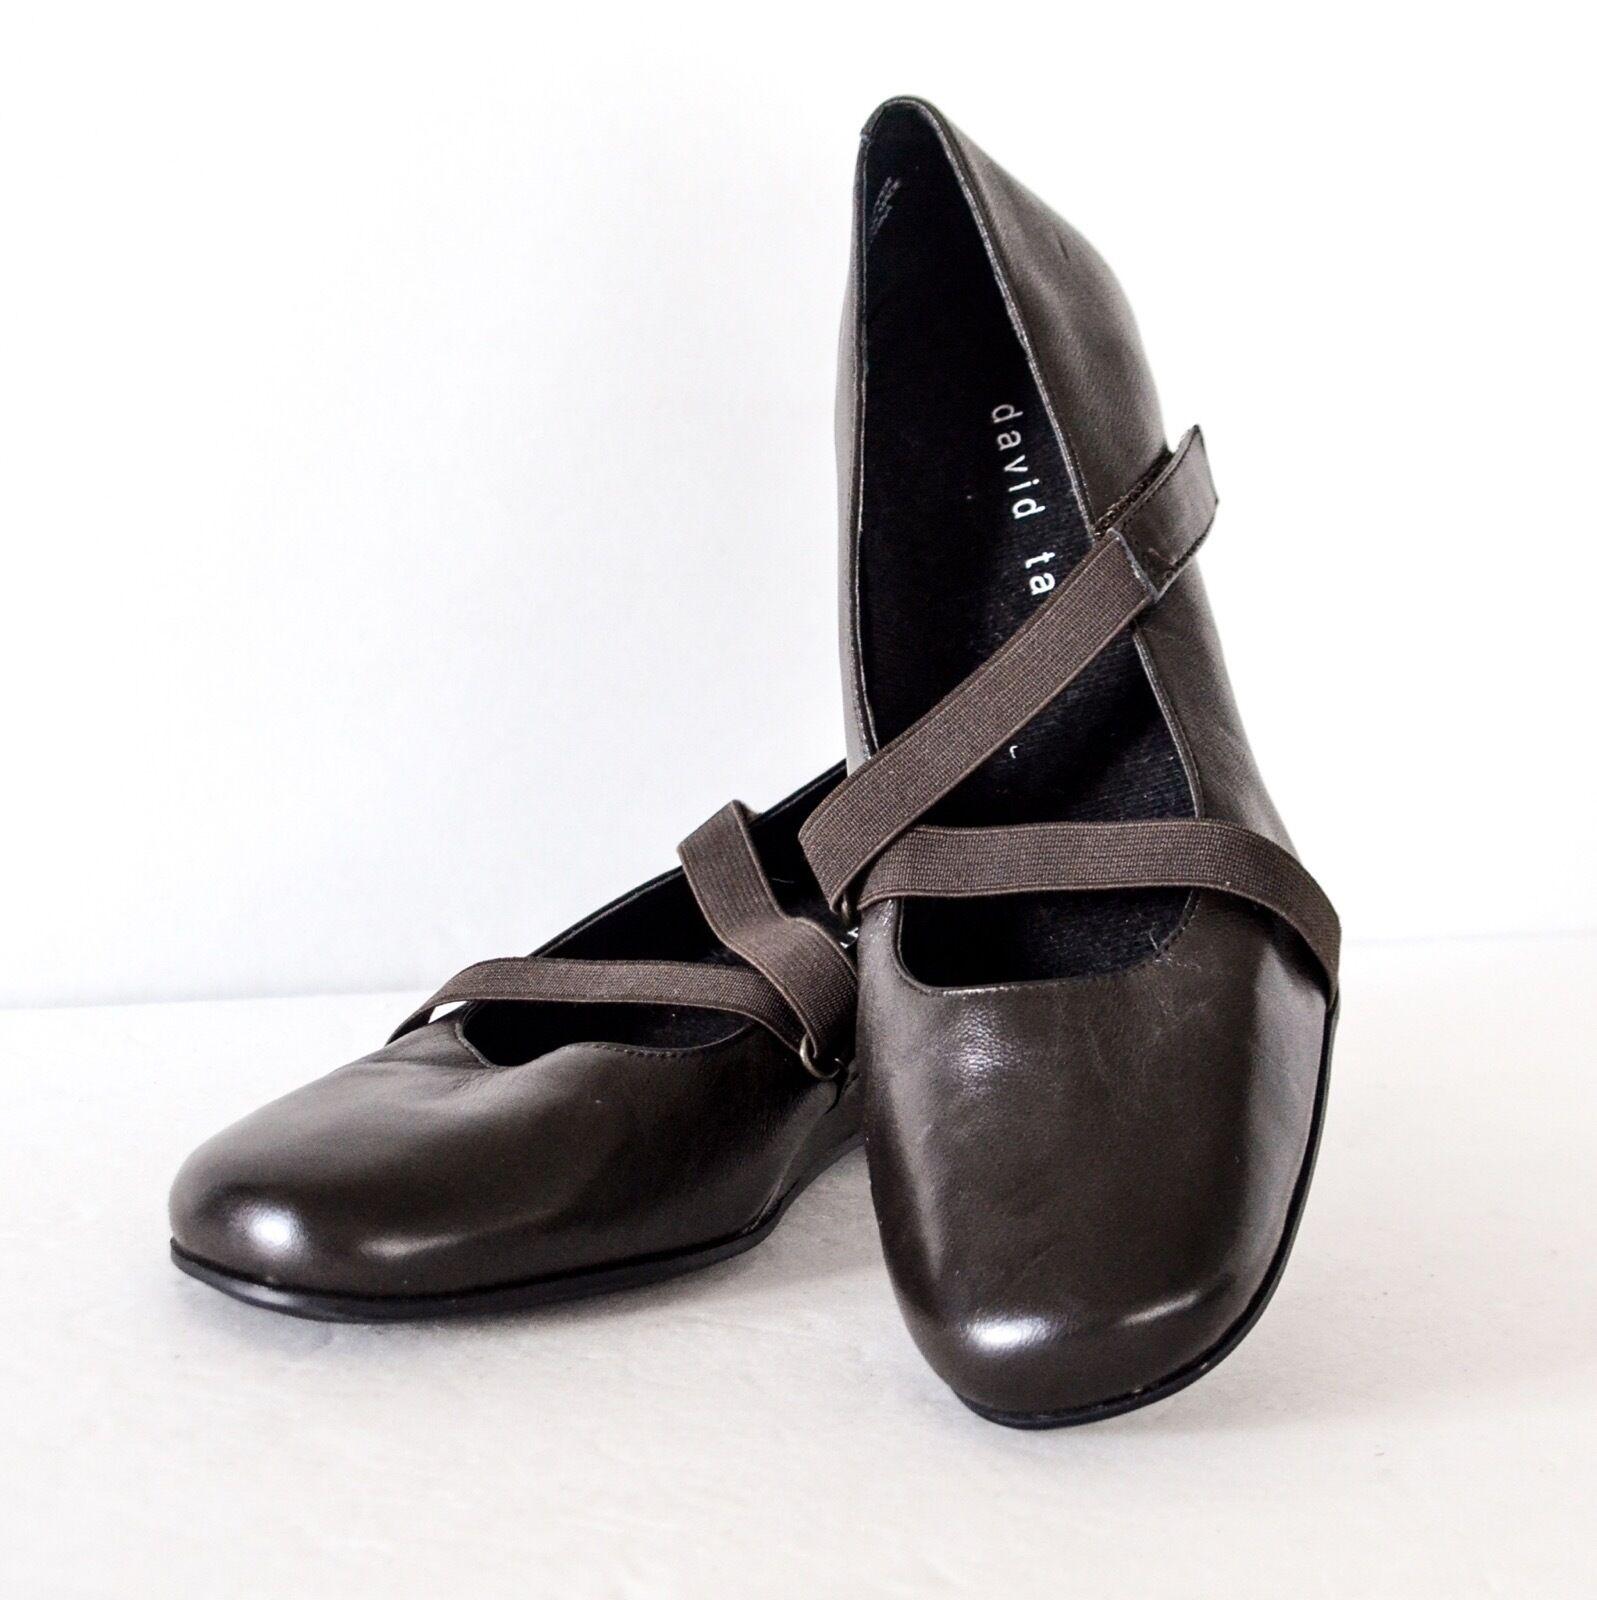 David Tate Olive Brown Leather Wedge Elastic strap closure Mary Jane shoes 9N